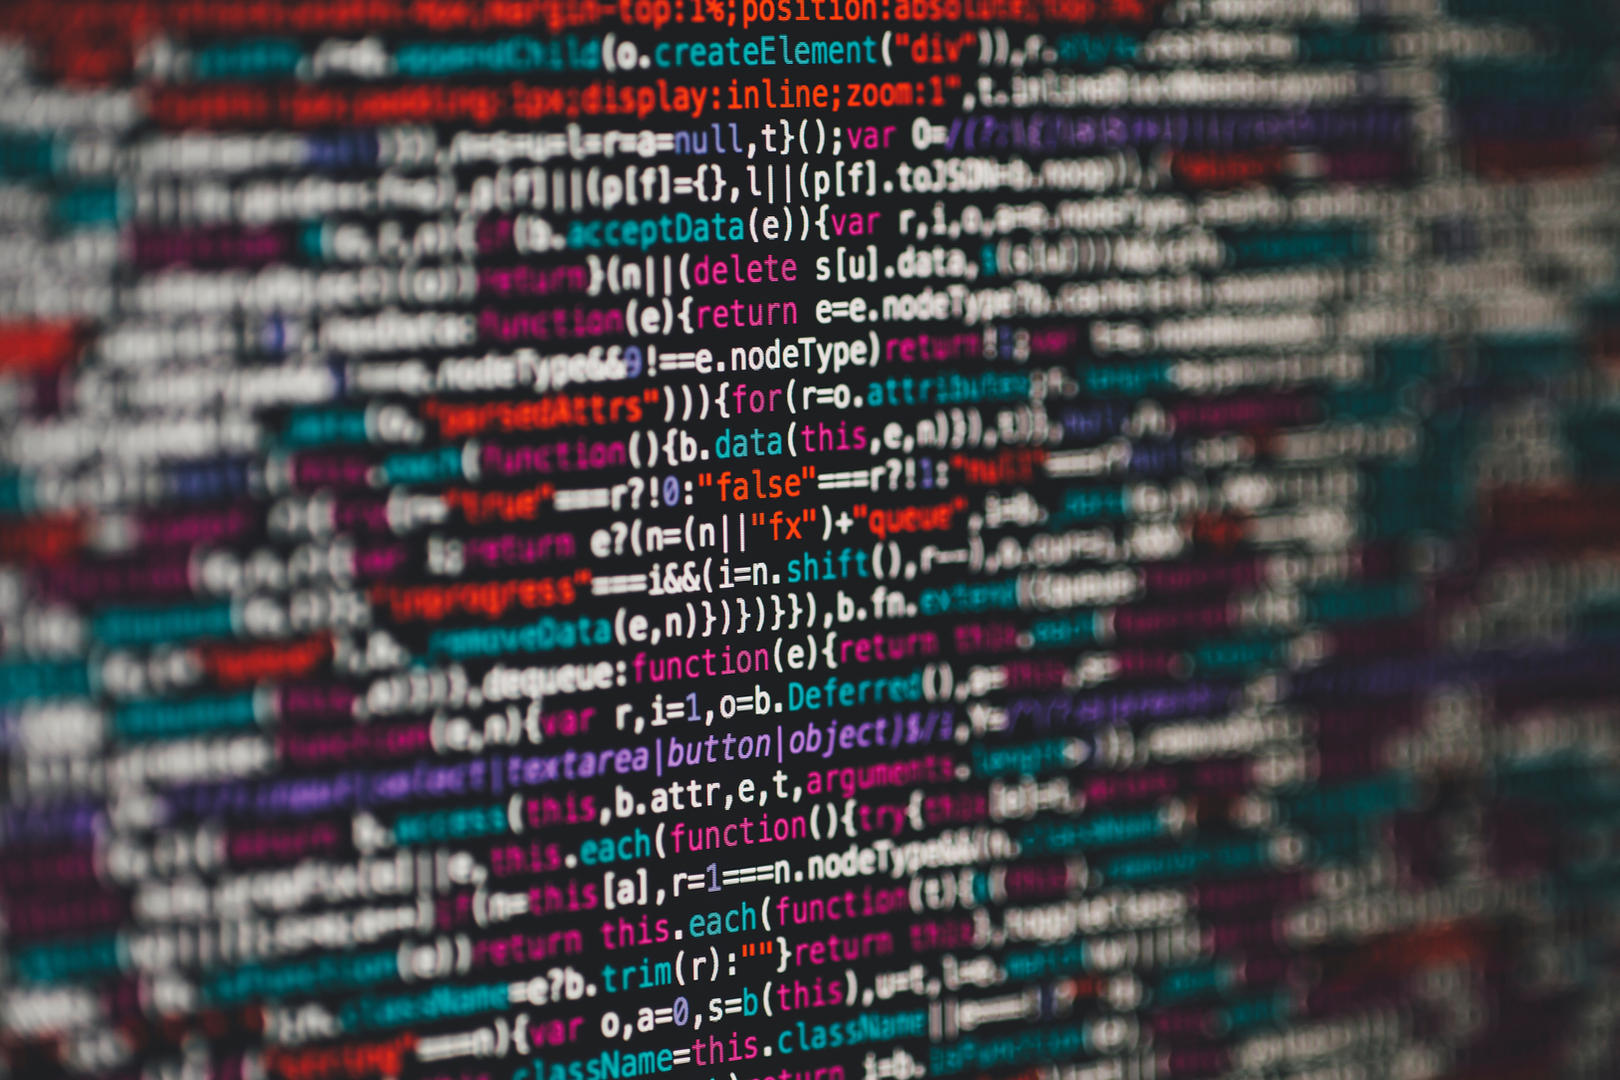 Multilingual Data Mining and Calibration